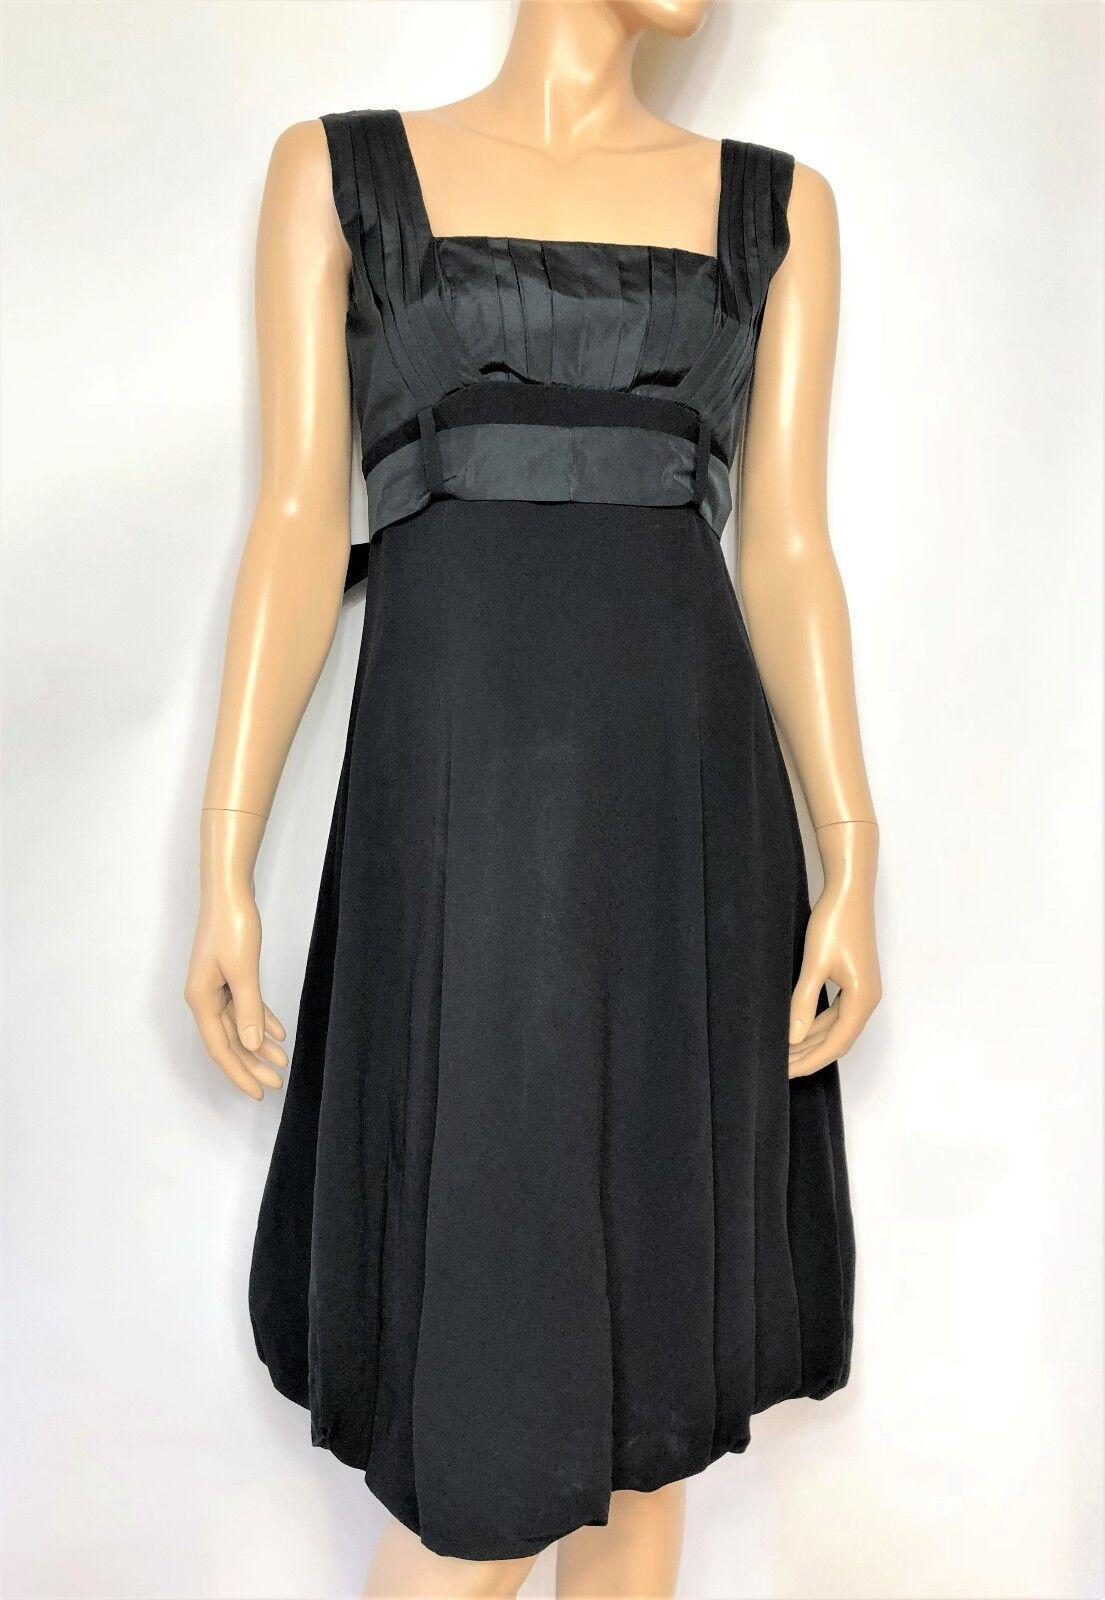 Italian brand vintage schwarz crepe dress with straps and belt - Größe 44 Italian